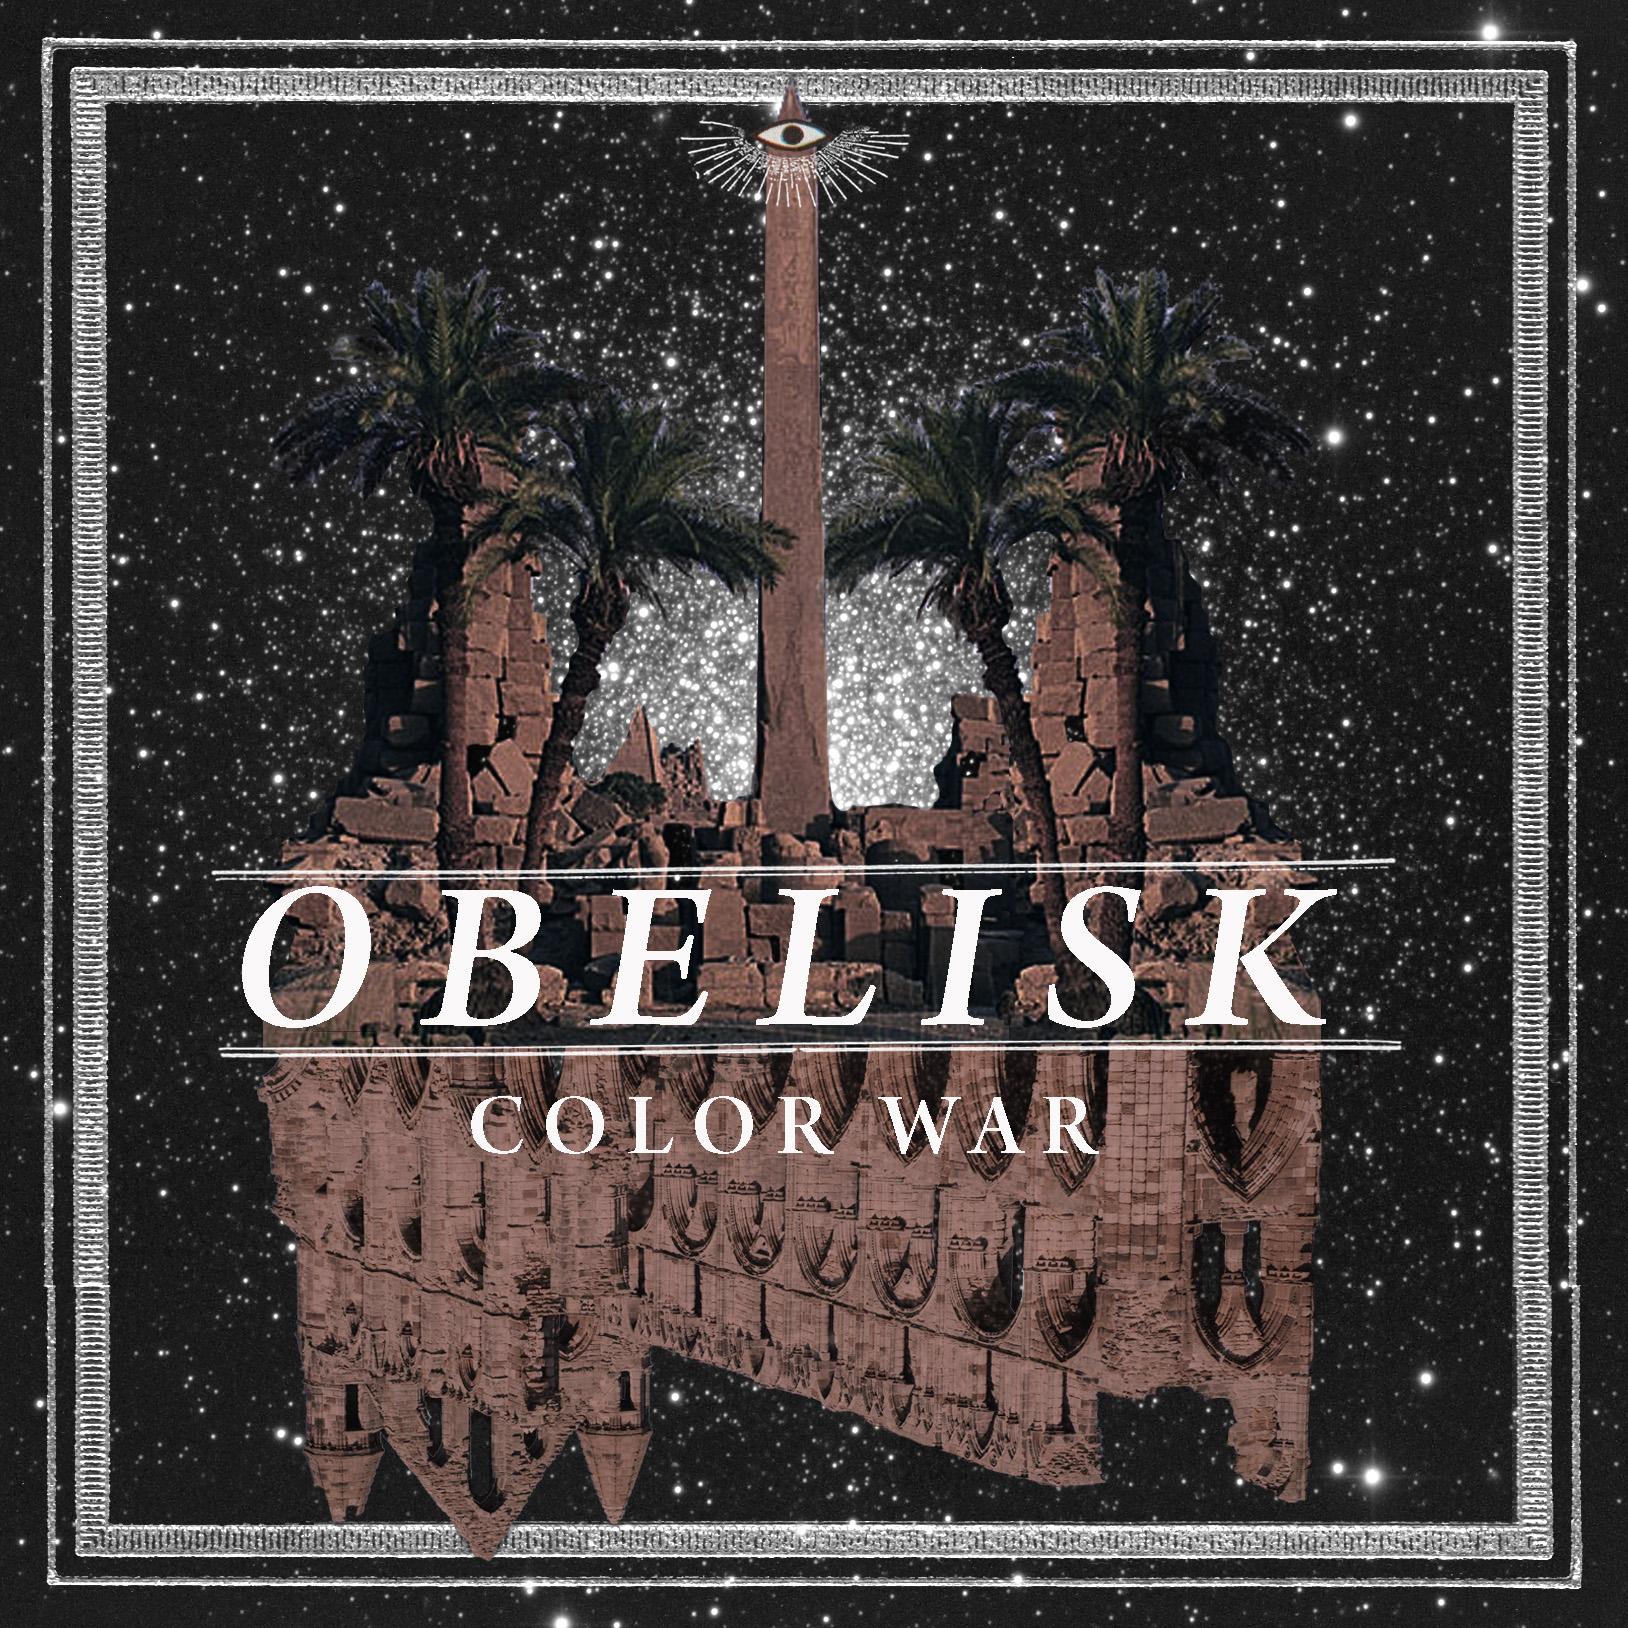 Obelisk_single-cover.jpg